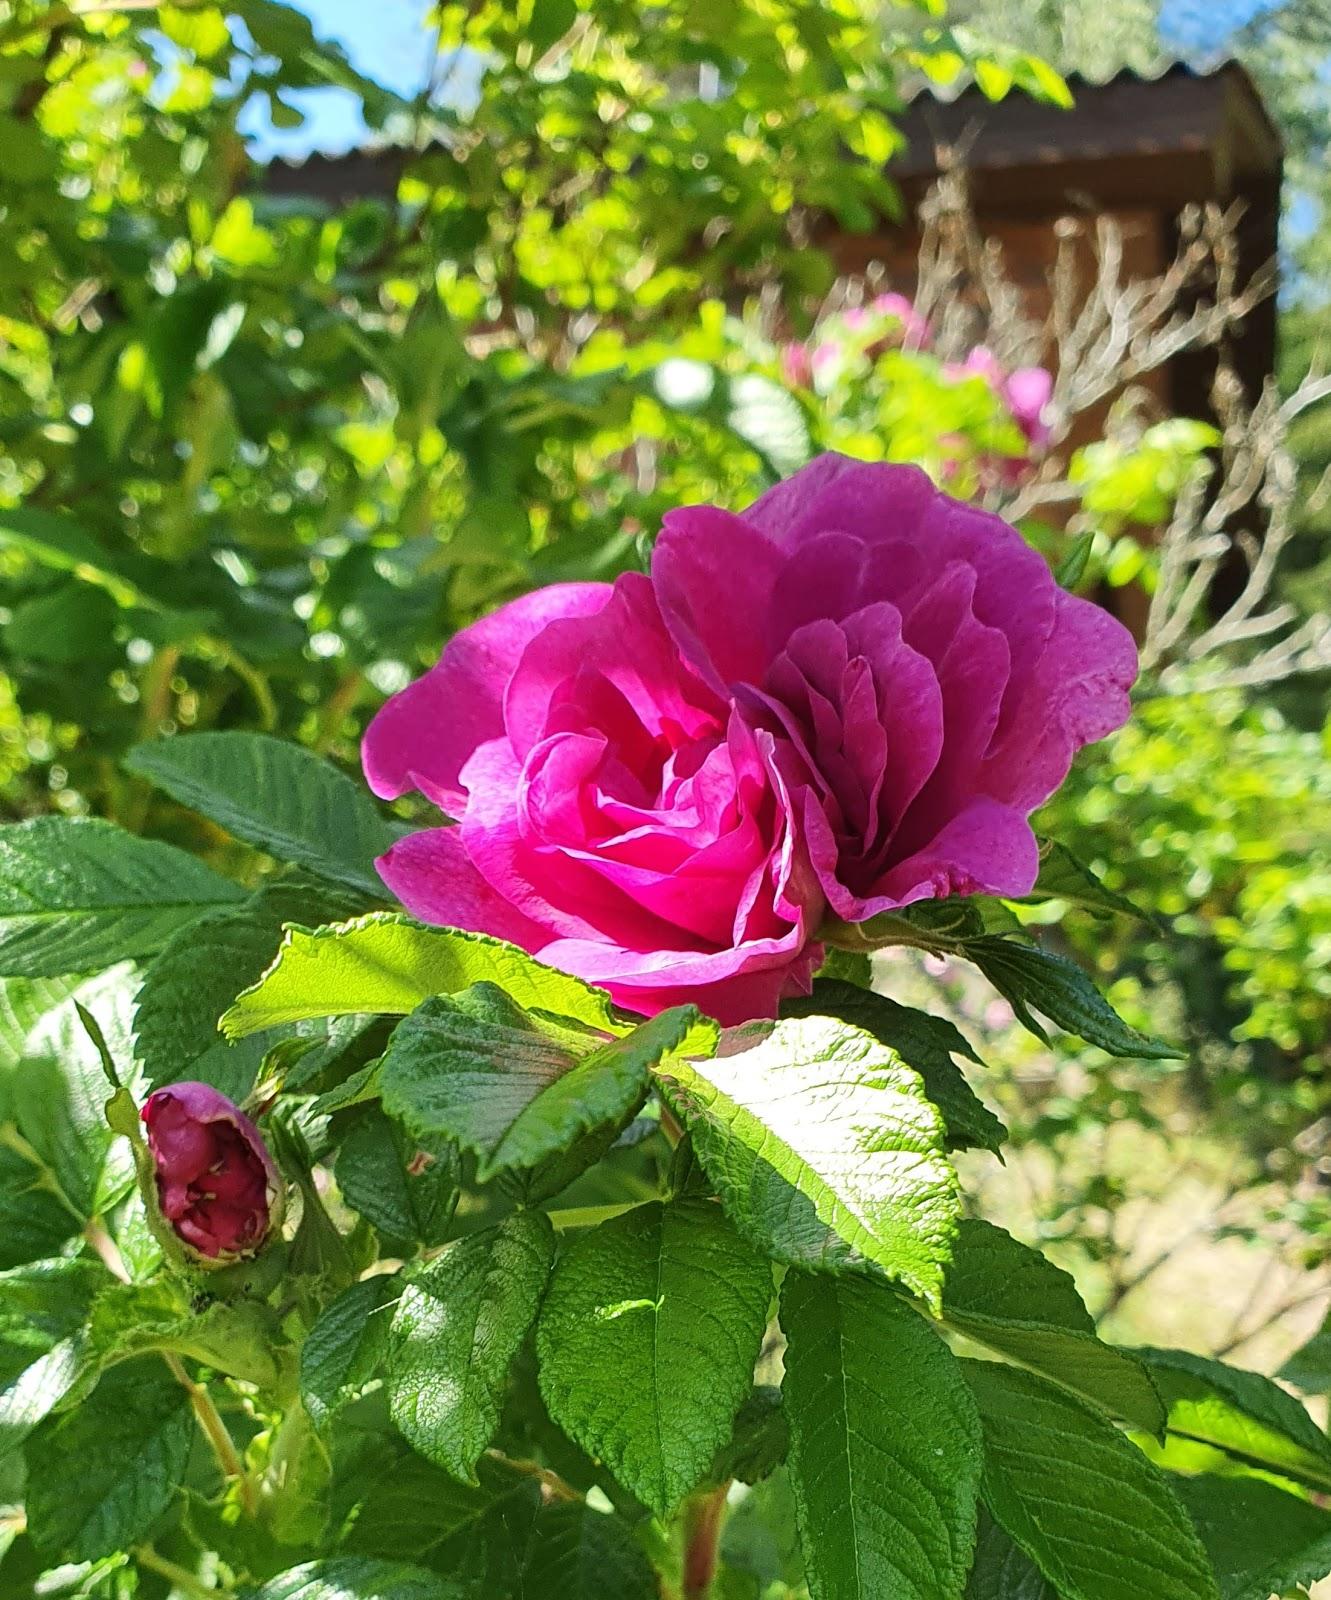 Pinkki ruusu